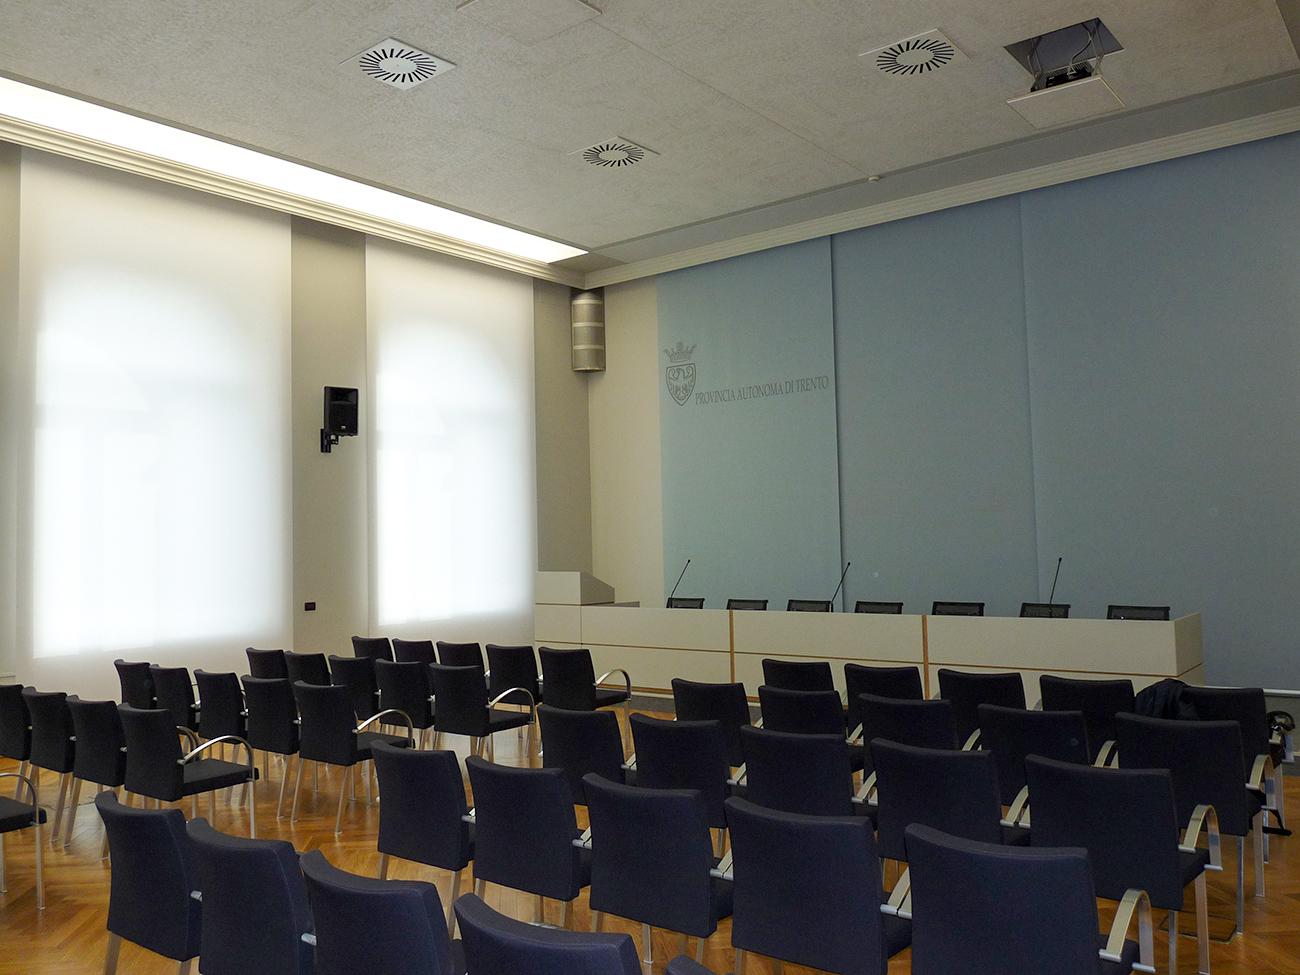 Sala stampa Provincia Autonoma di Trento